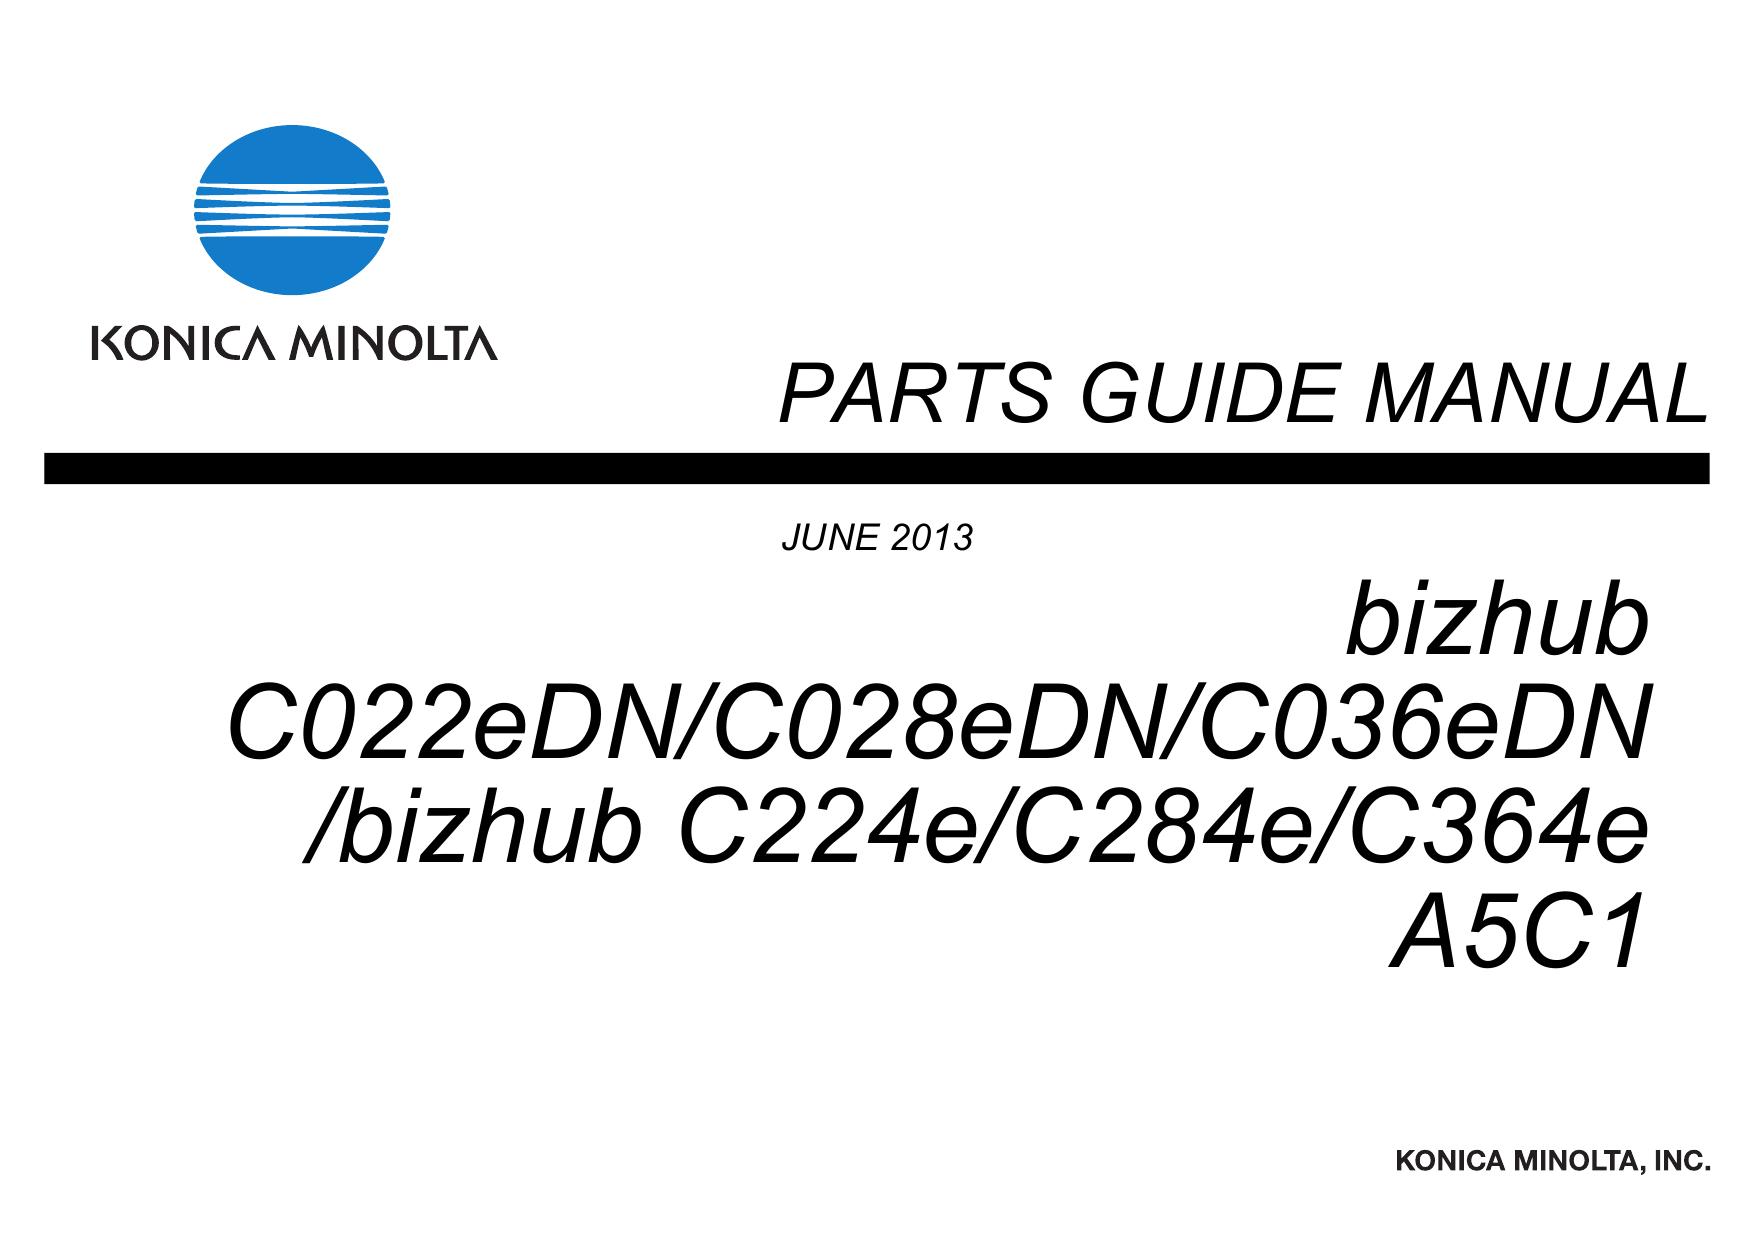 Konica minolta bizhub 364e manual